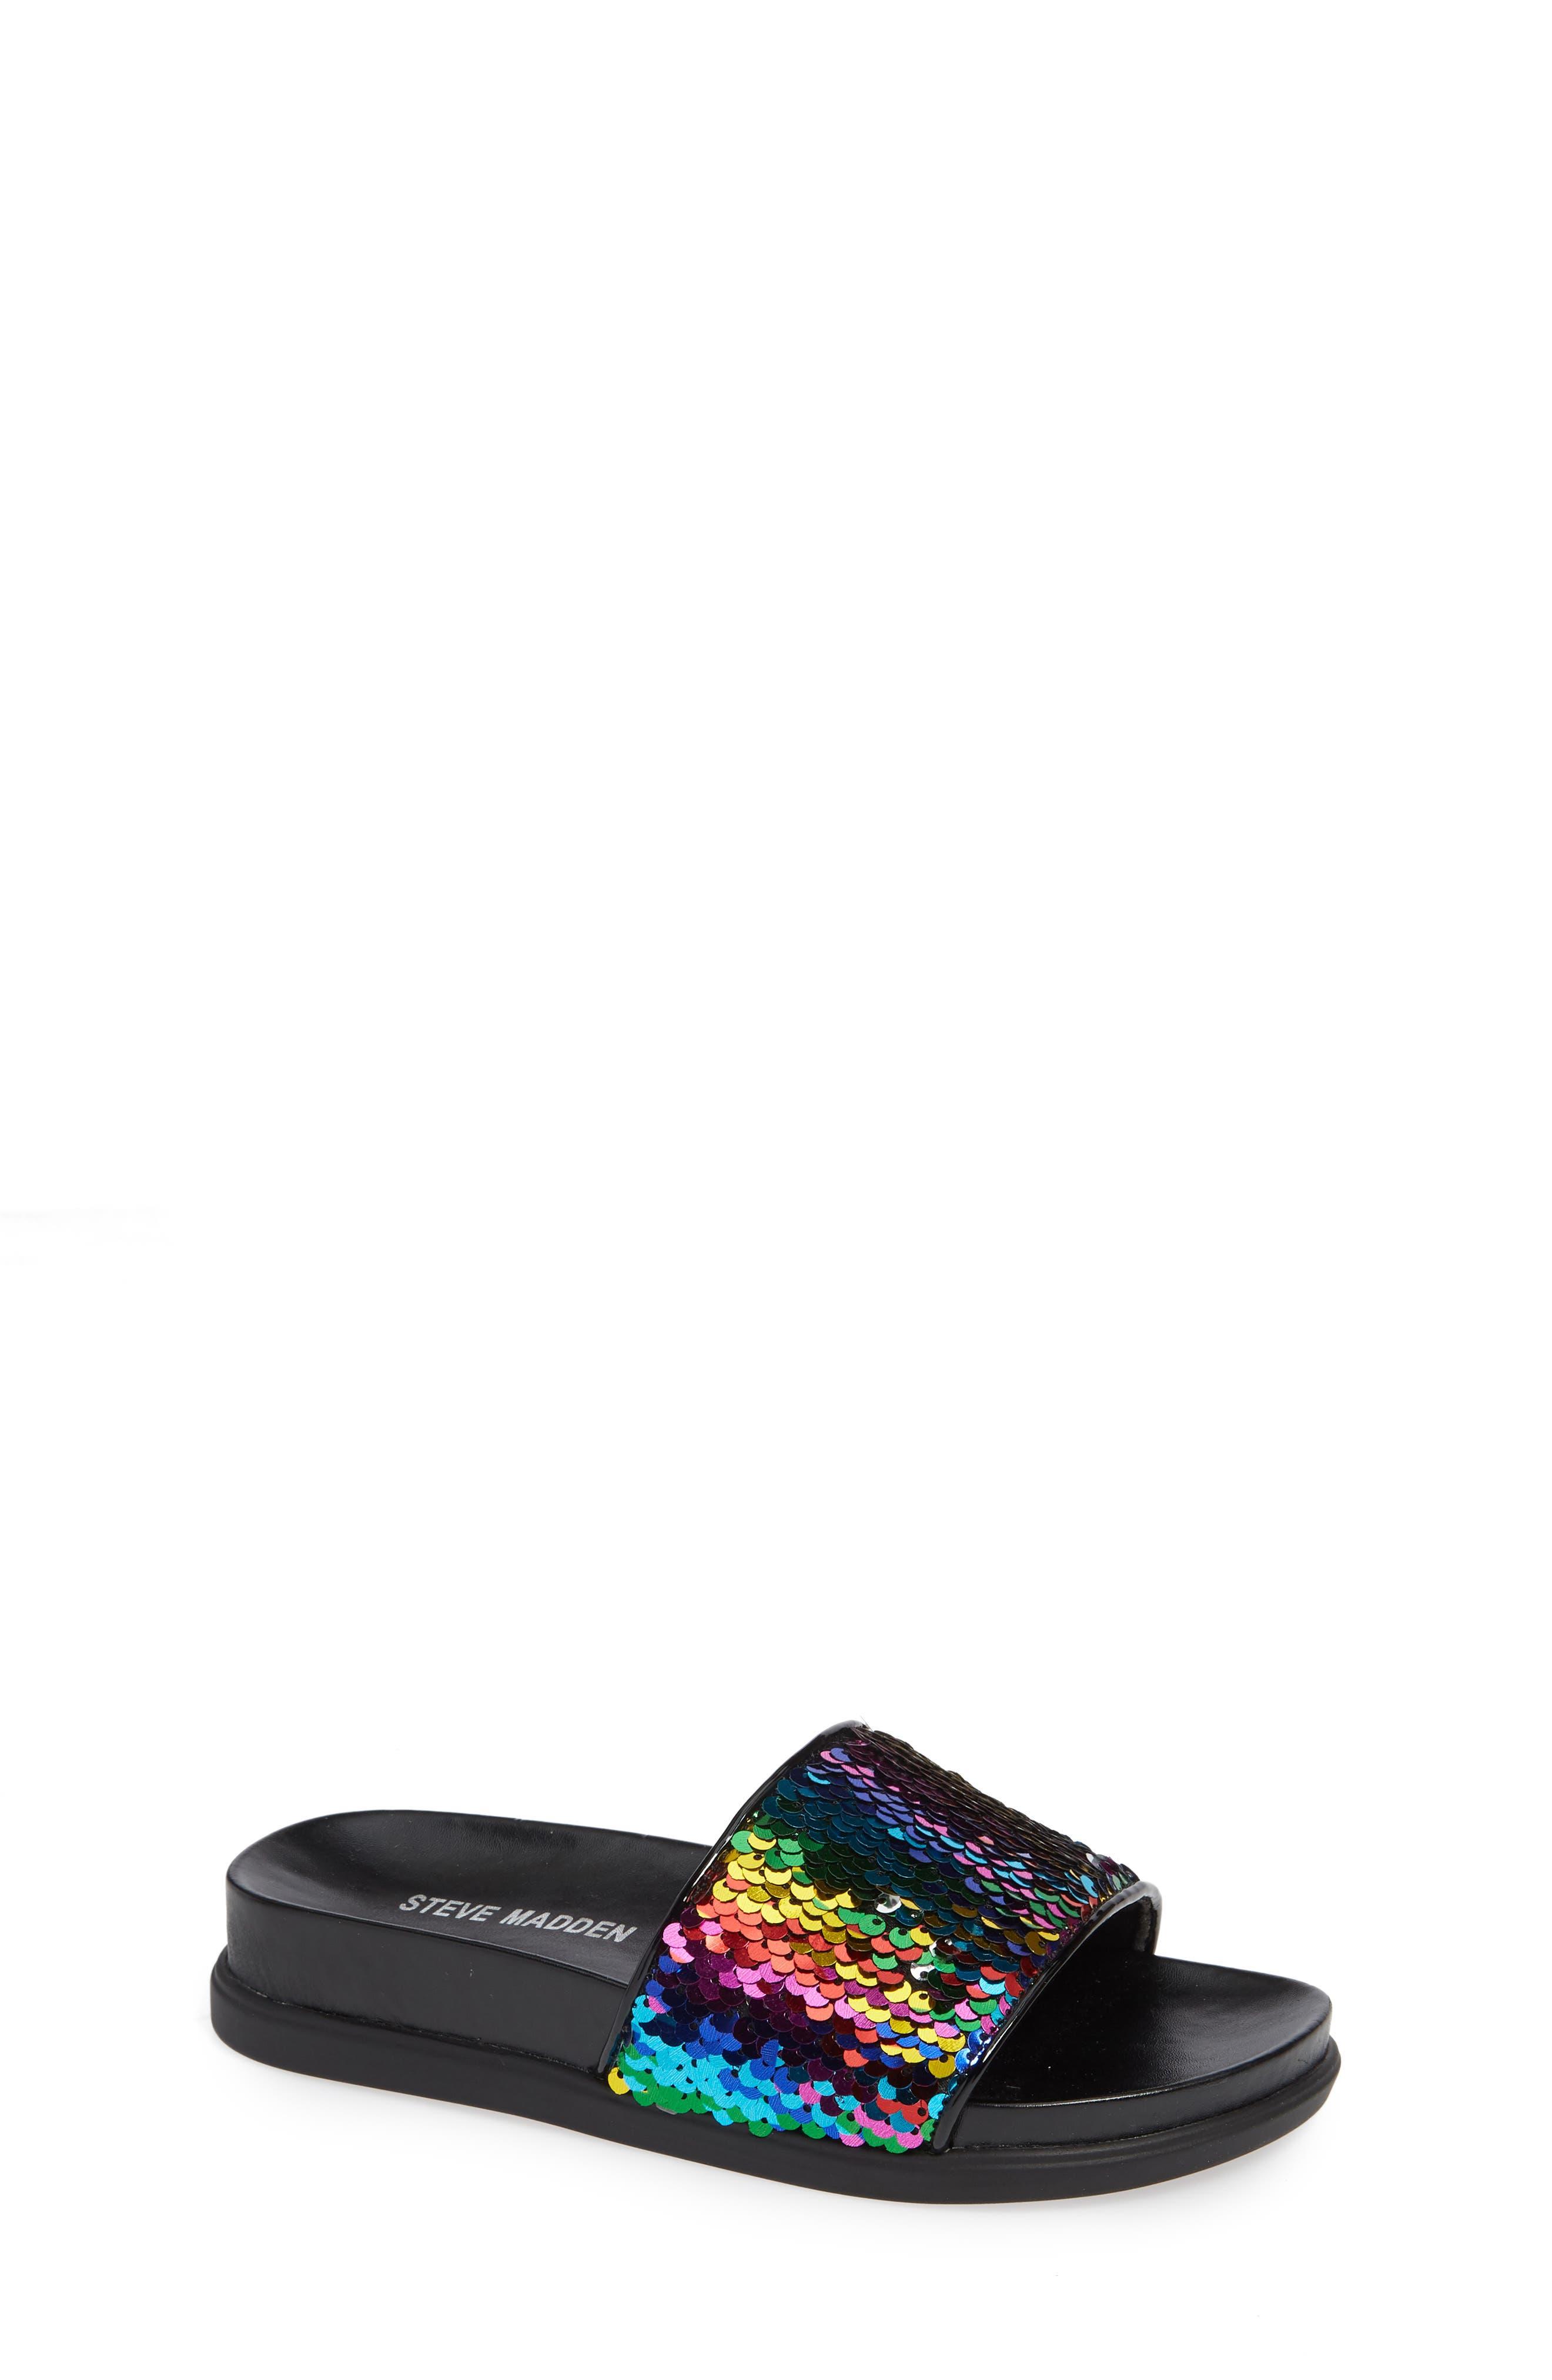 JFLIPS Slide Sandal, Main, color, BLACK MULTI